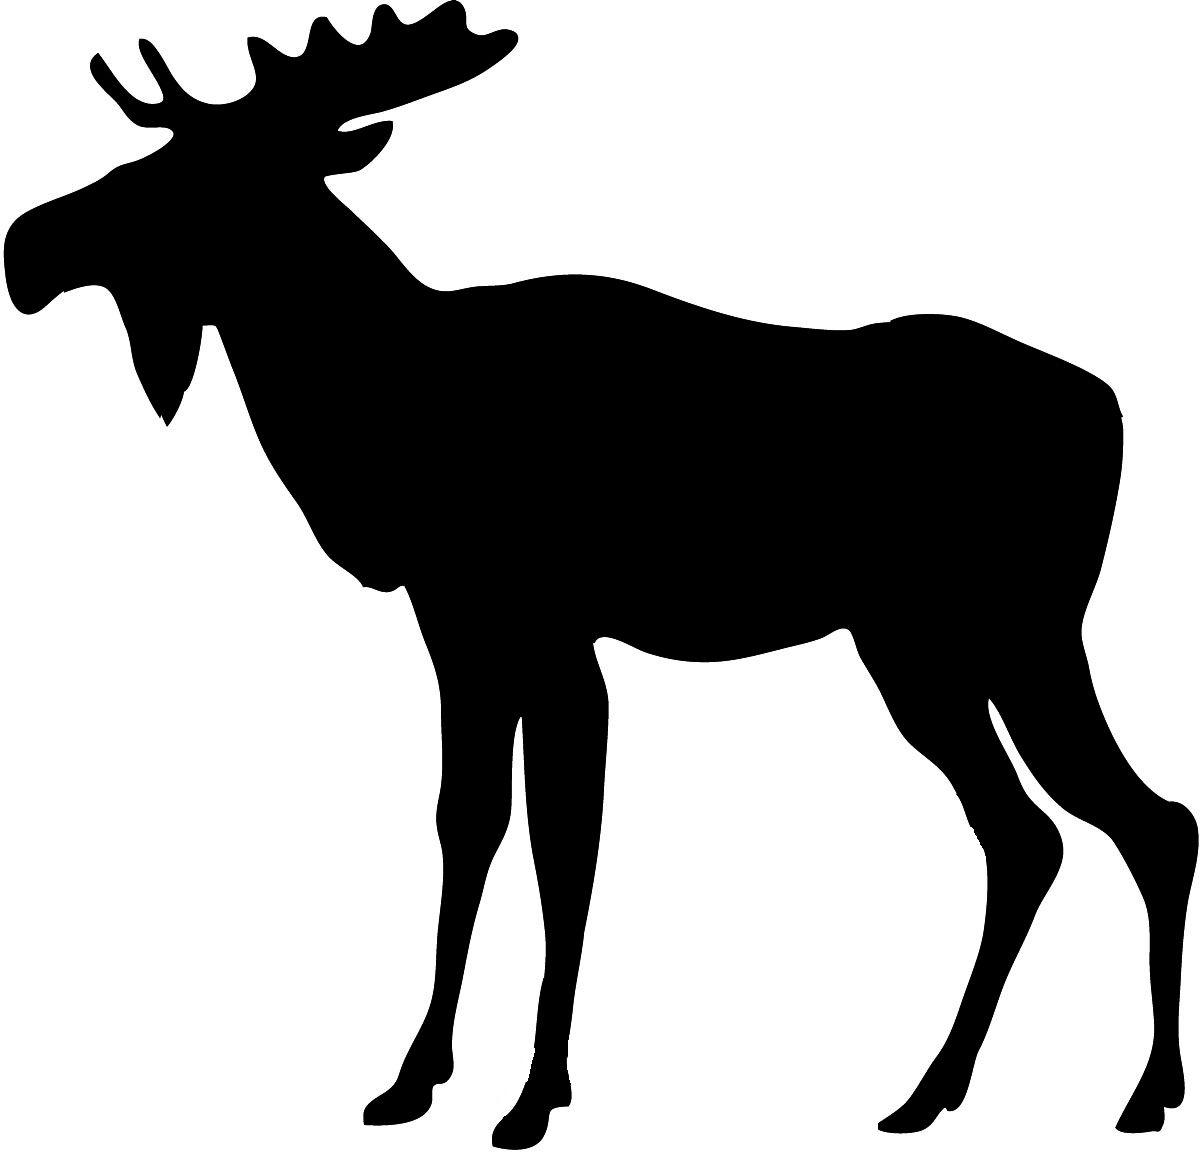 animal silhouette  animalsilhouettemoose  clocks  - cute black and white moose head clipart horse silhouette